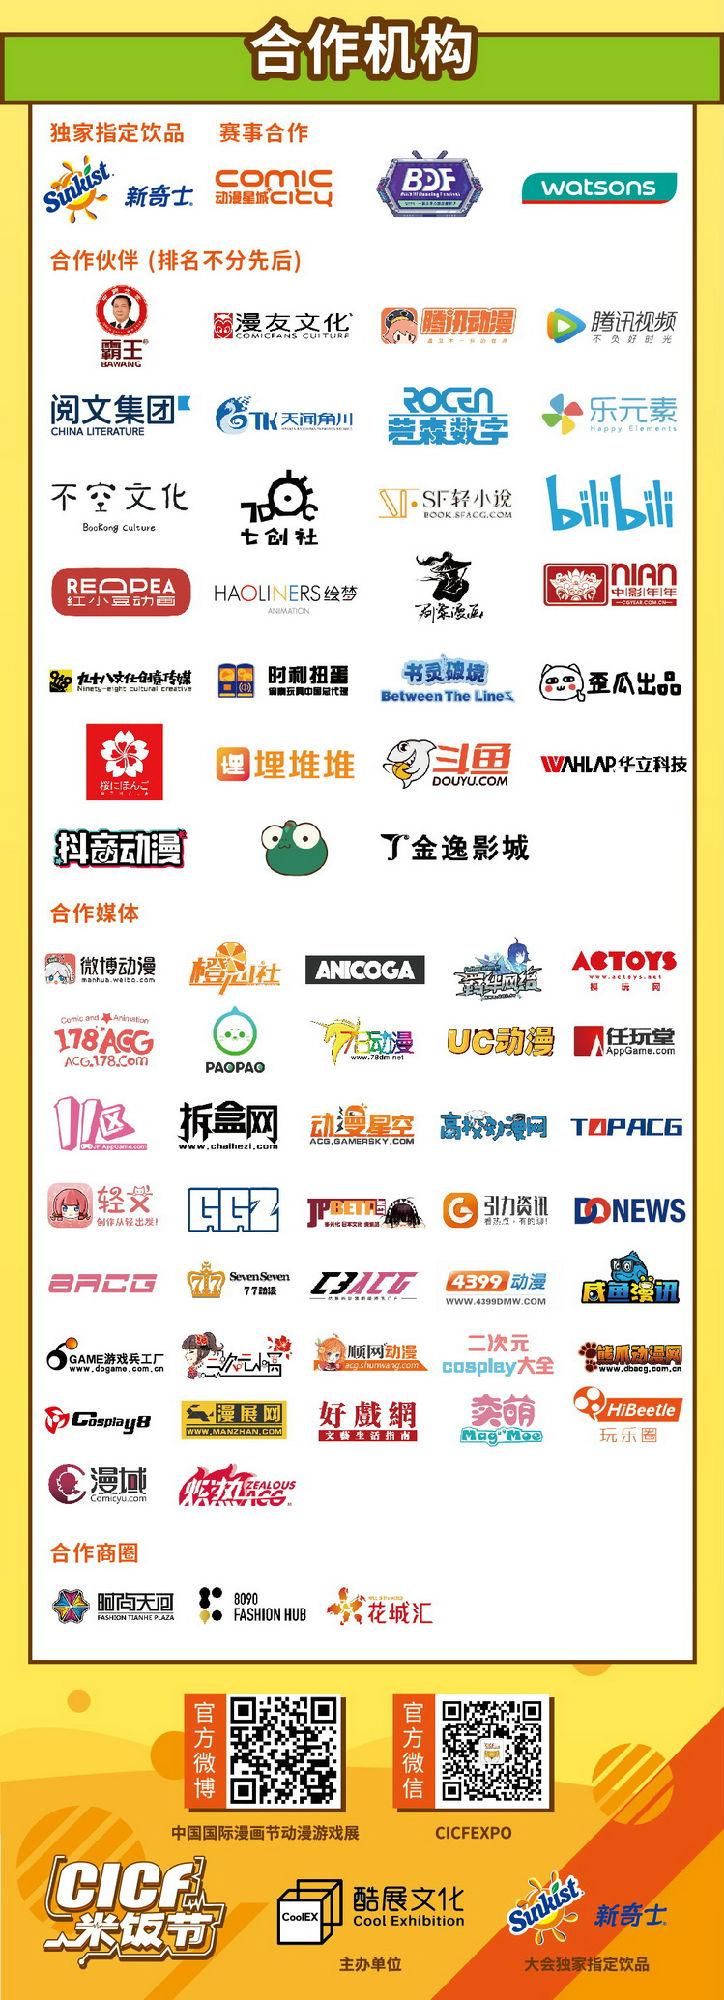 CICF米饭节全天星级嘉宾阵容!!ALL STAR活动时间及福利全公布!-ANICOGA